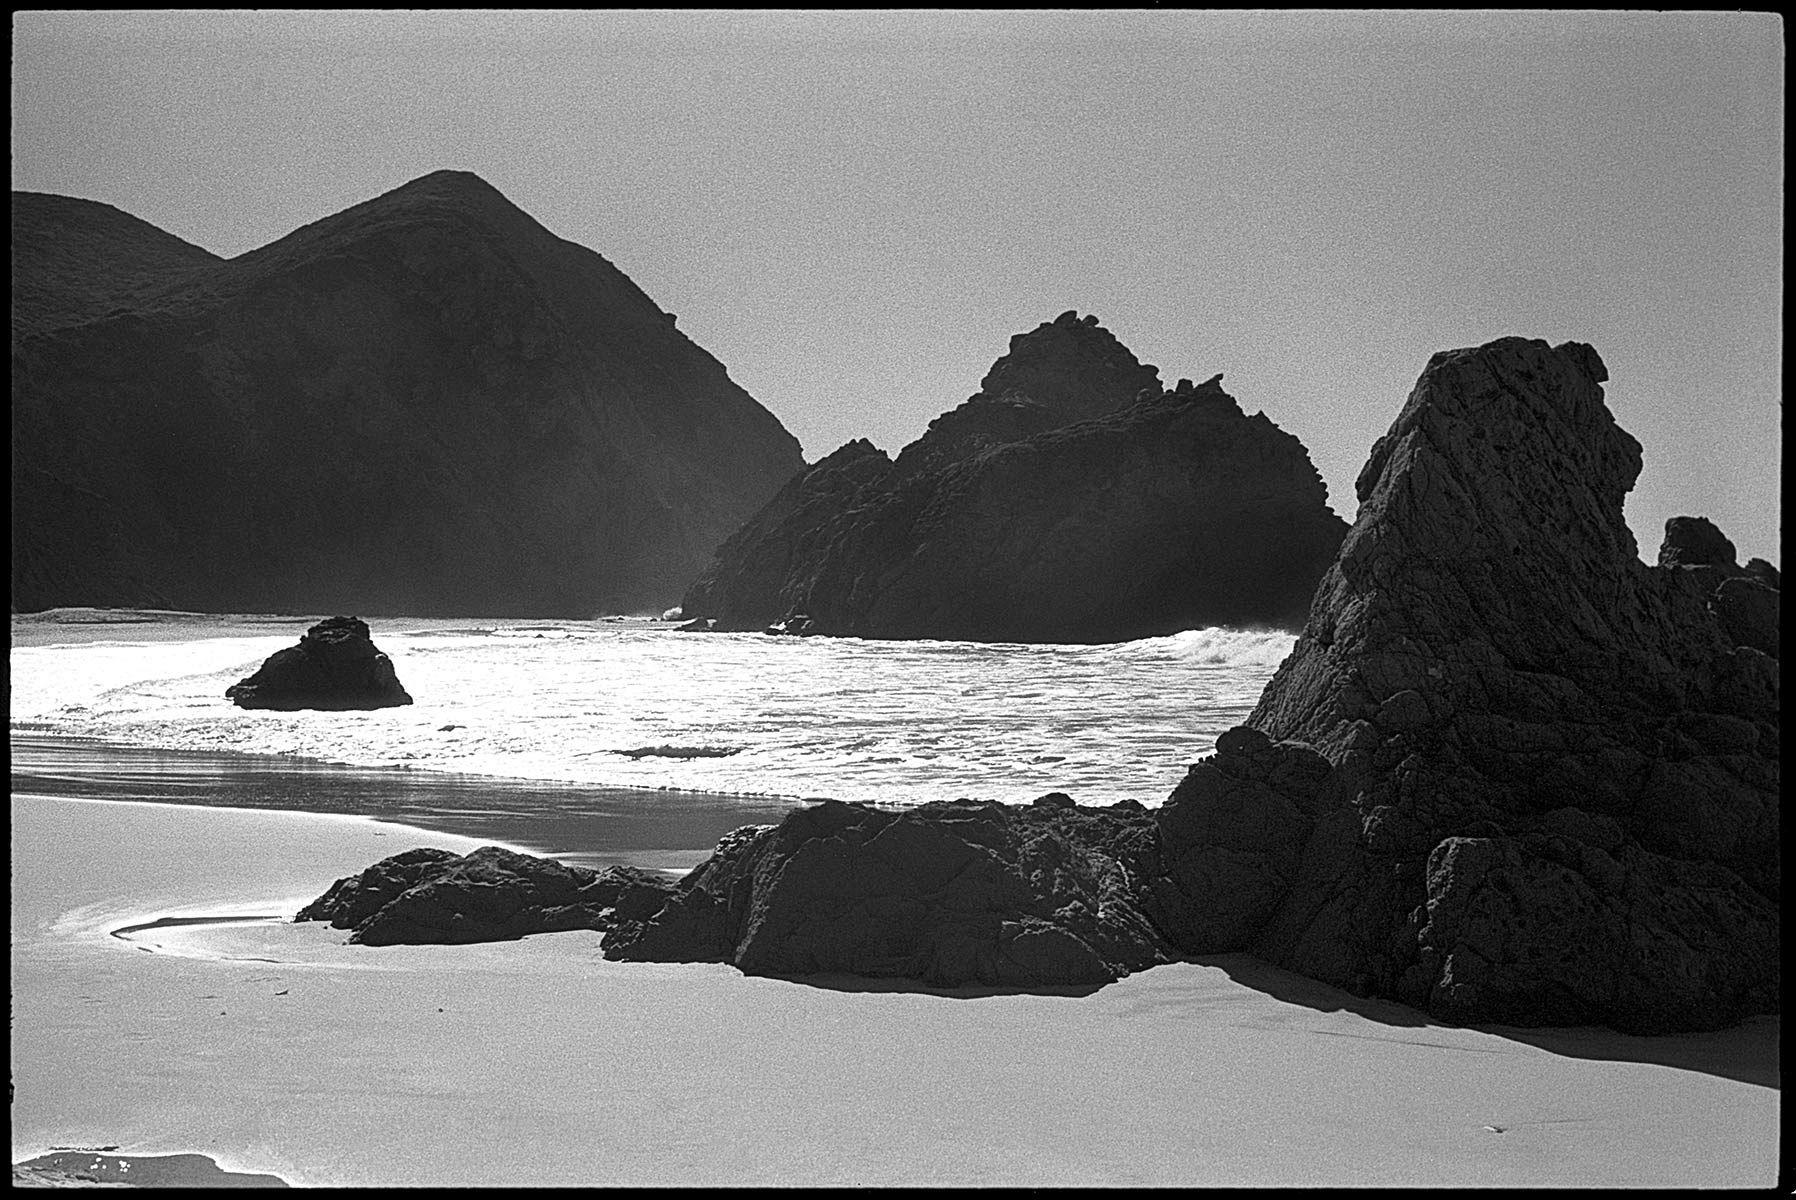 Pfeiffer Beach, Big Sur, b&w, film, Pacific Ocean, landscape,  Stephen Collector